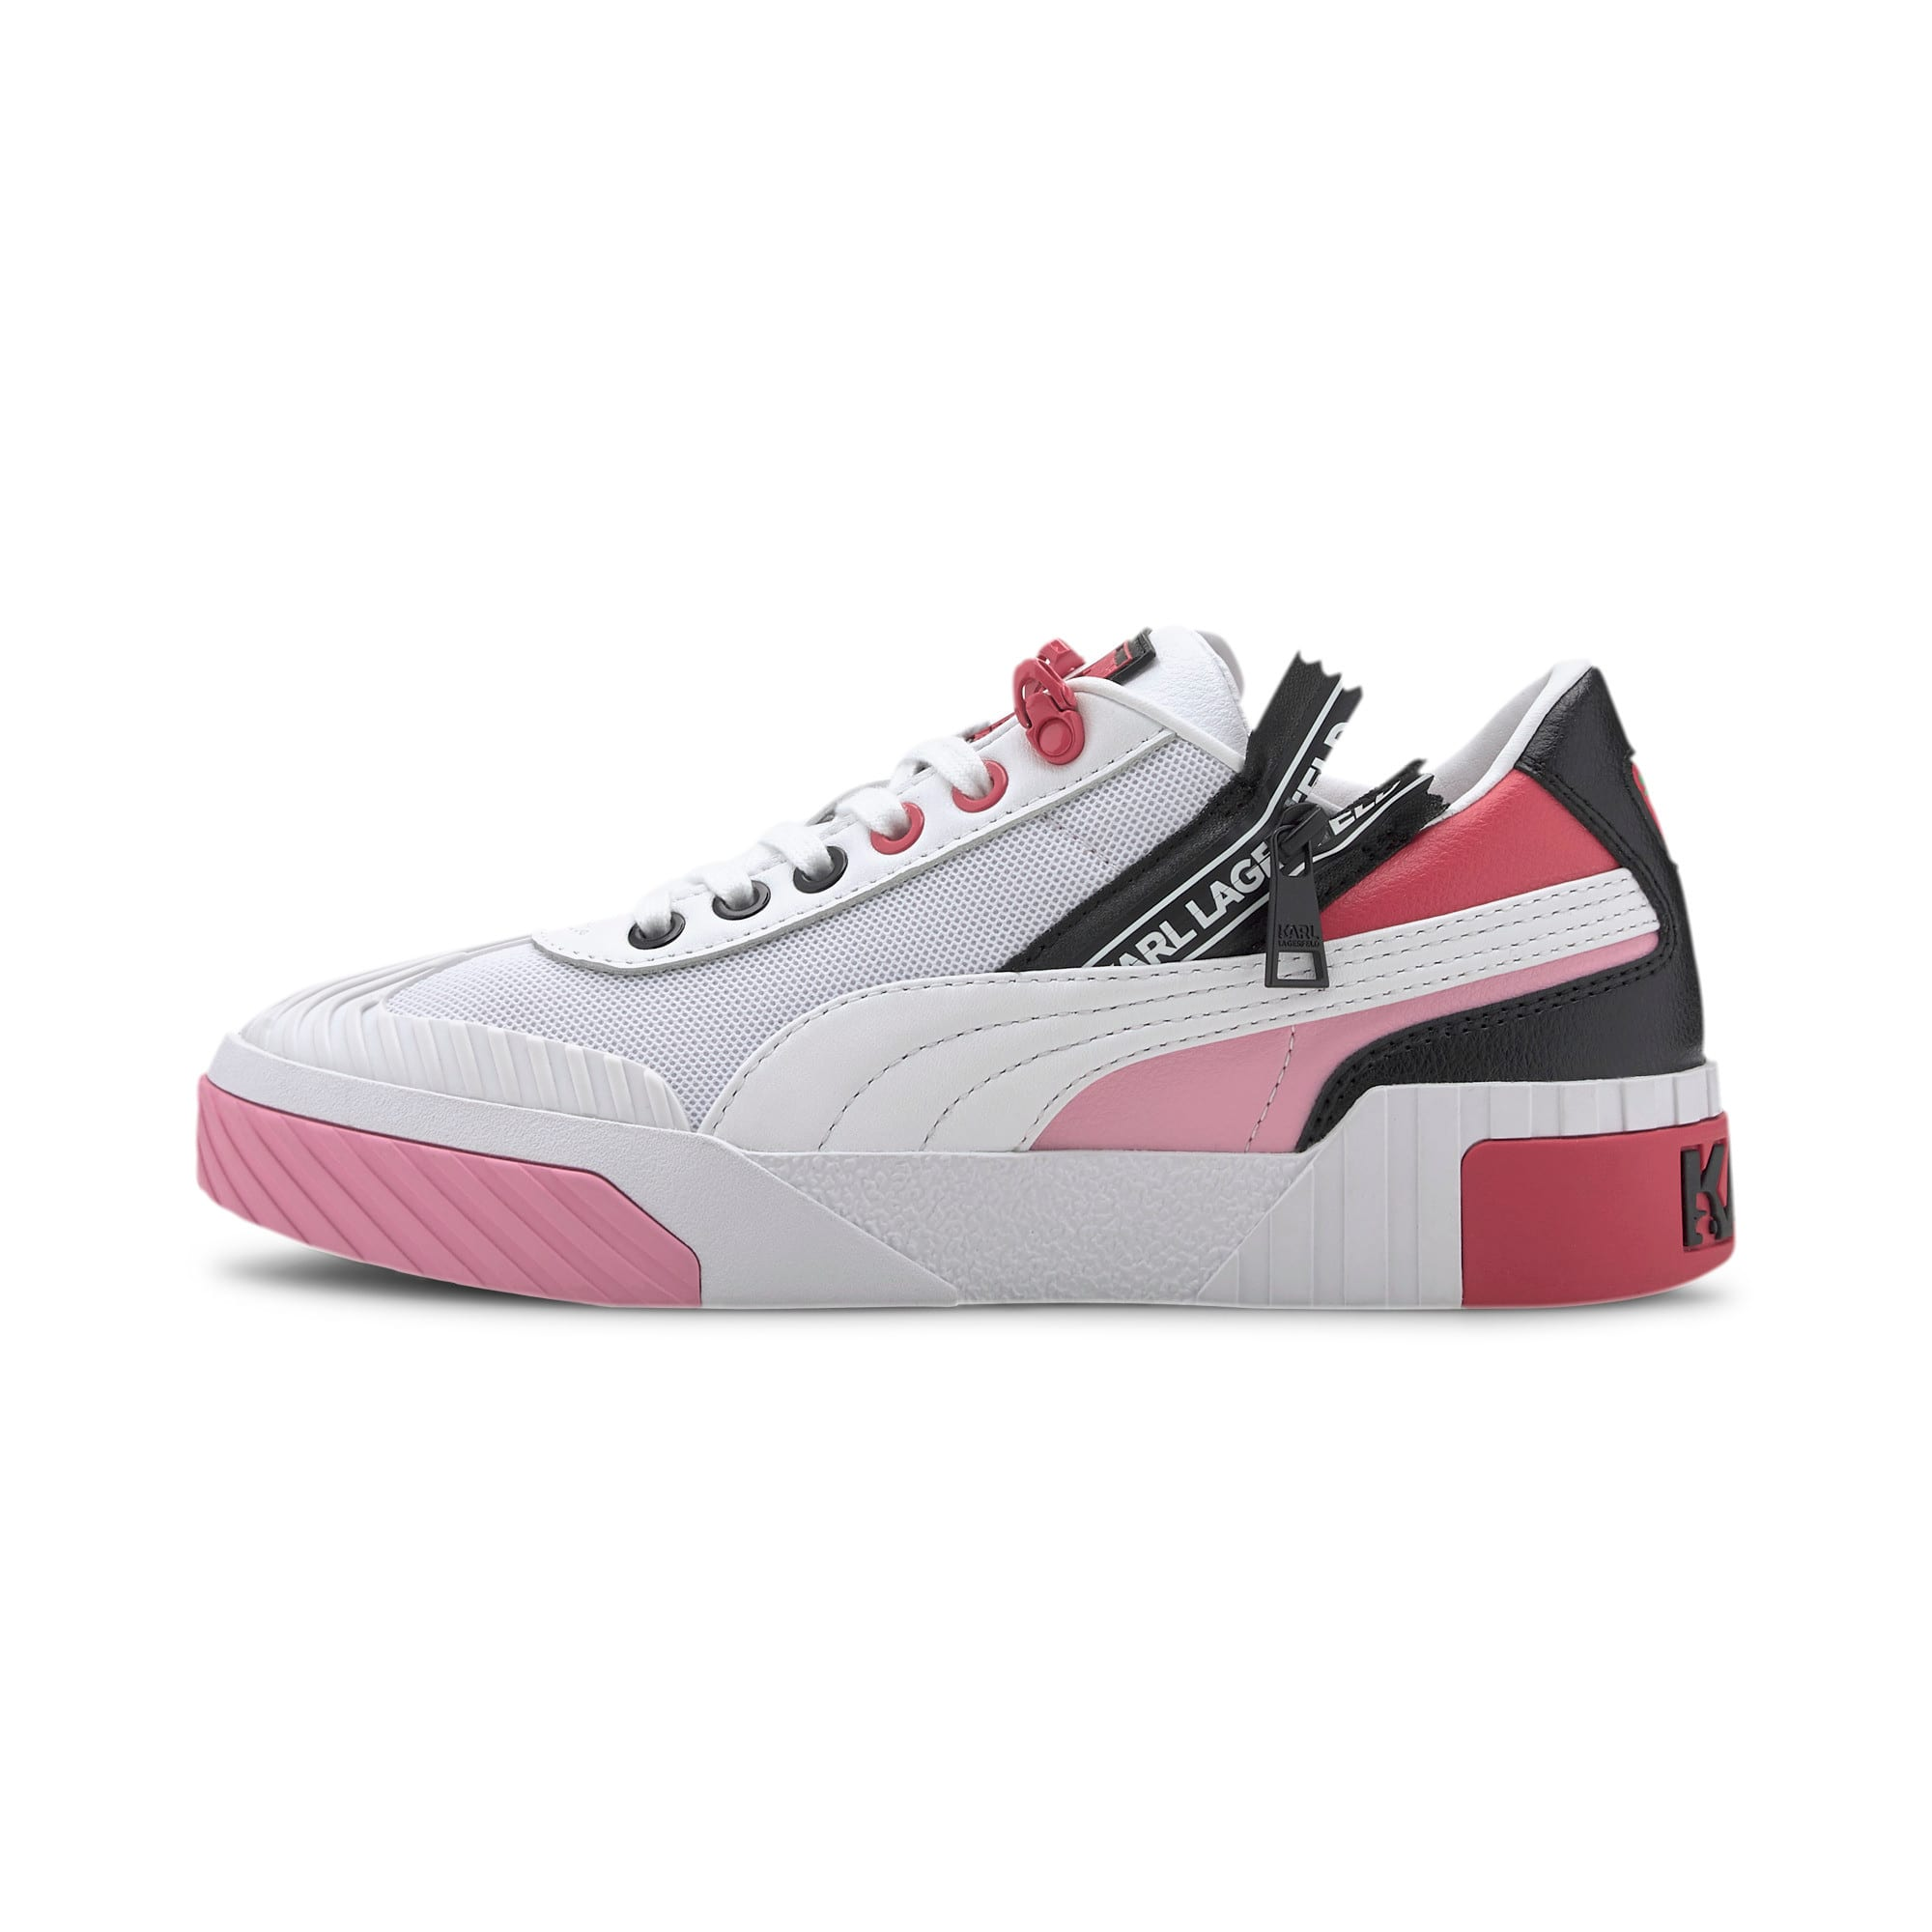 Thumbnail 1 of PUMA x KARL LAGERFELD Cali Women's Training Shoes, Puma White-PRISM PINK, medium